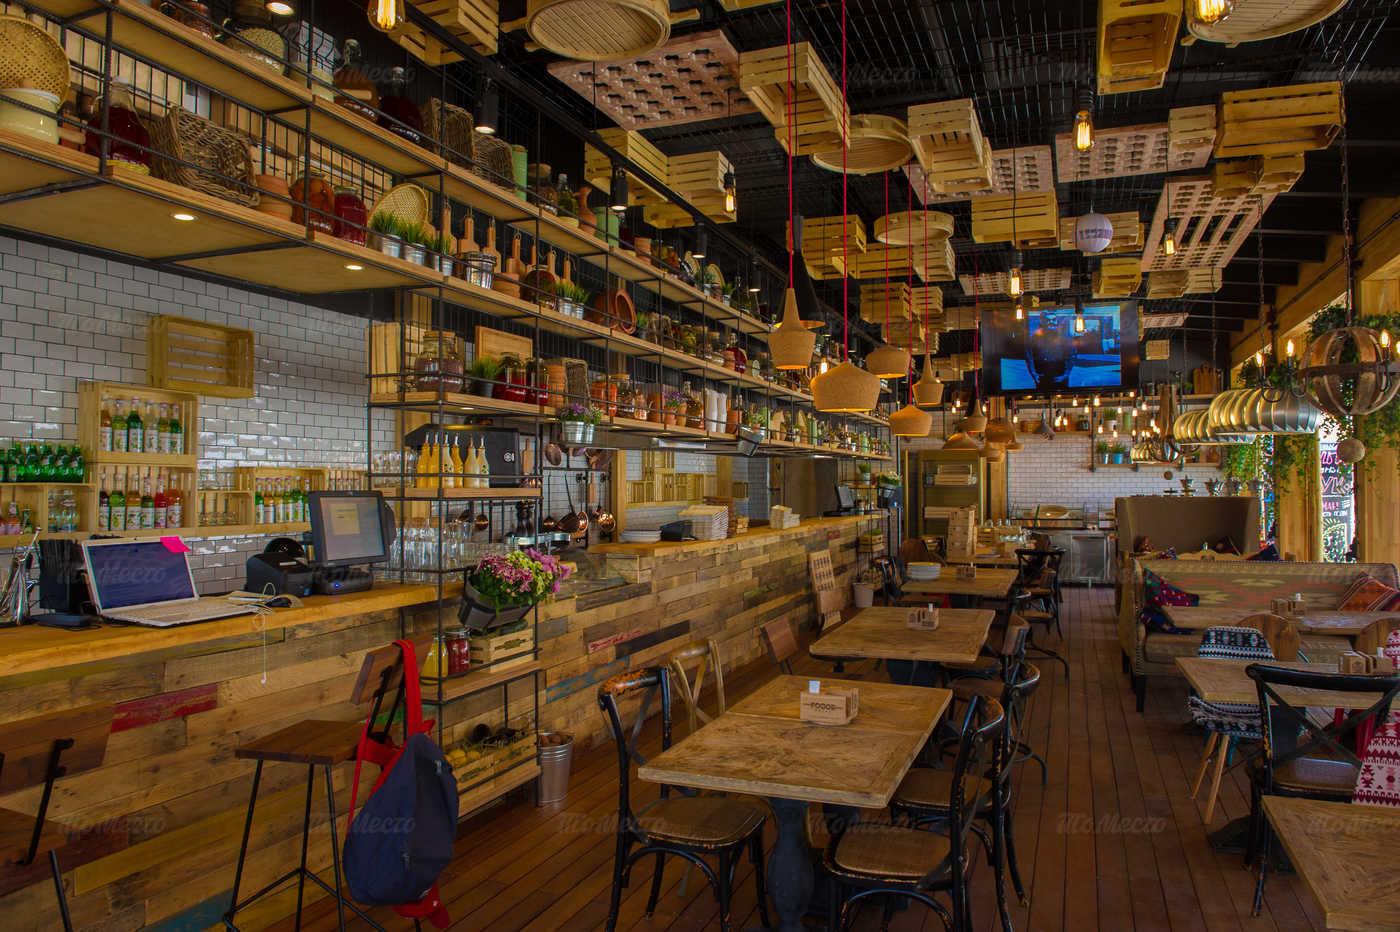 Банкеты ресторана FOOD BAZAR (Фуд базар) на улице Каретный Ряд фото 6